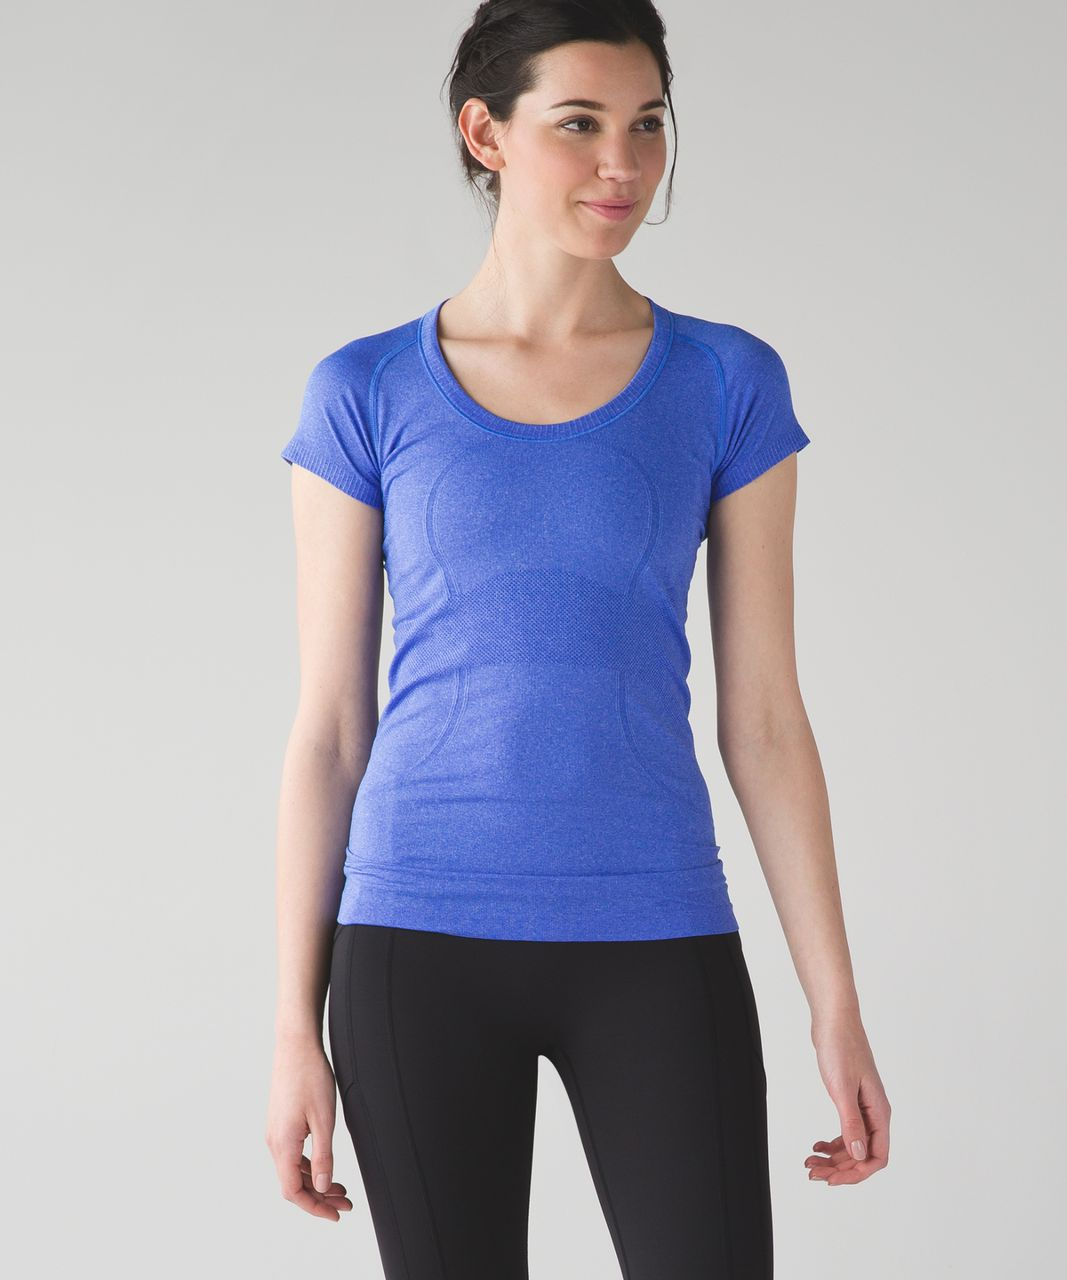 b33aa605c32 Lululemon Swiftly Tech Short Sleeve Scoop - Heathered Harbor Blue - lulu  fanatics